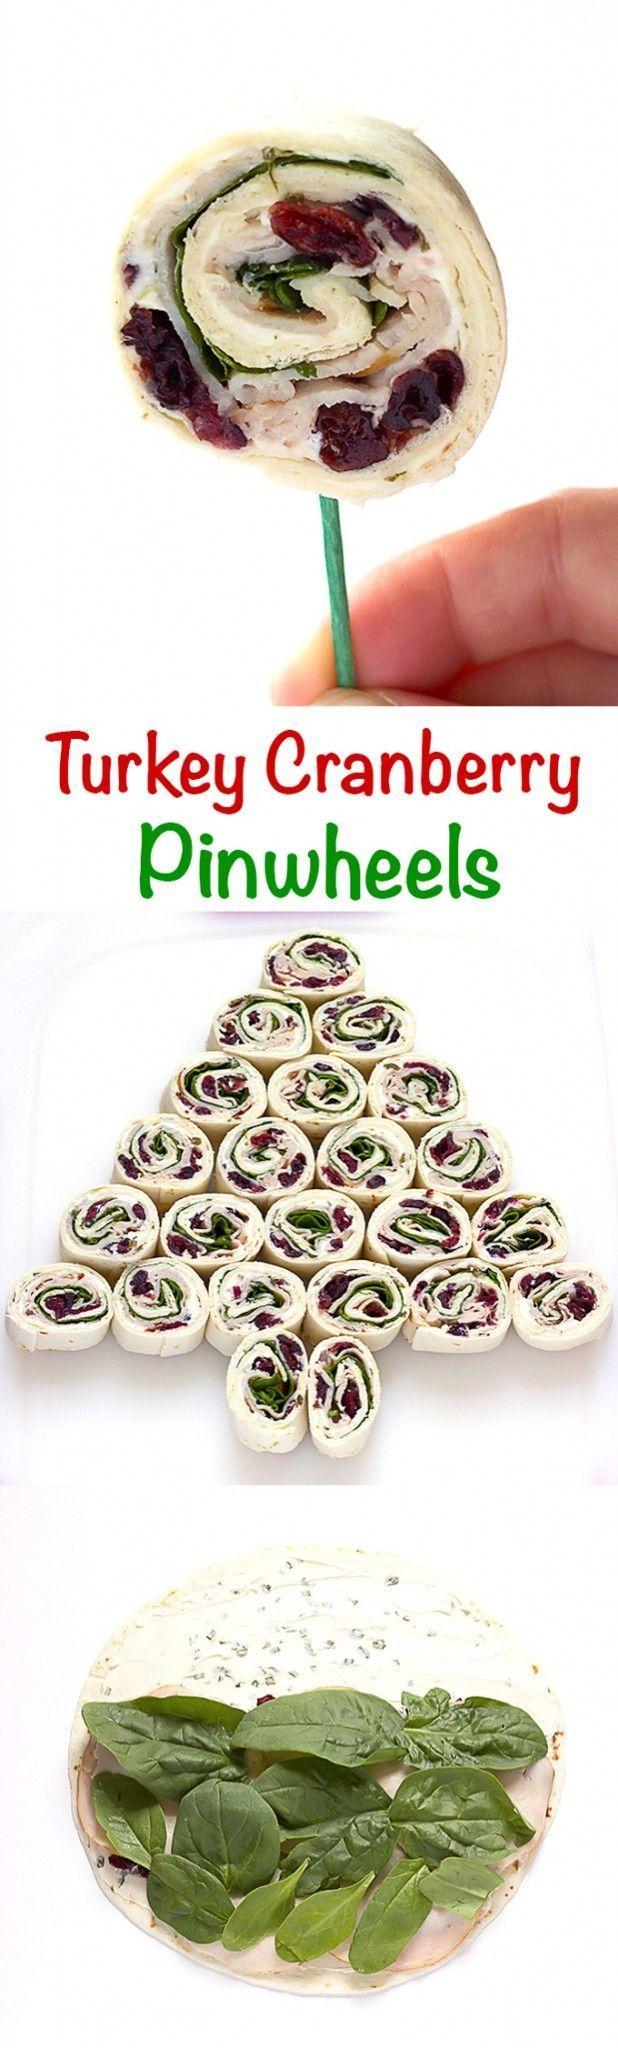 Turkey Cranberry Pinwheels The Wholesome Dish